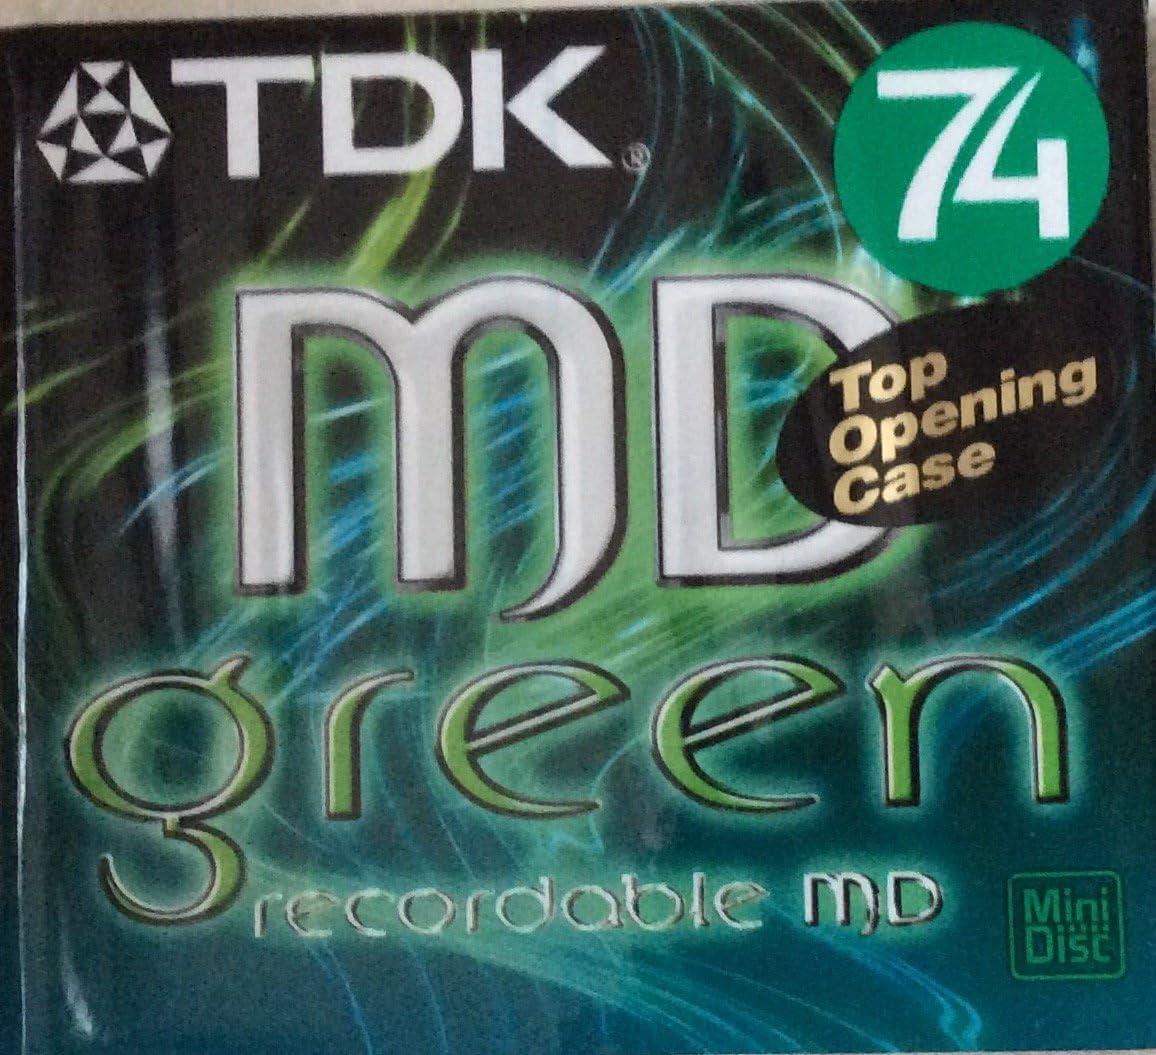 Tdk Minidisc Grün 74 Min Computer Zubehör